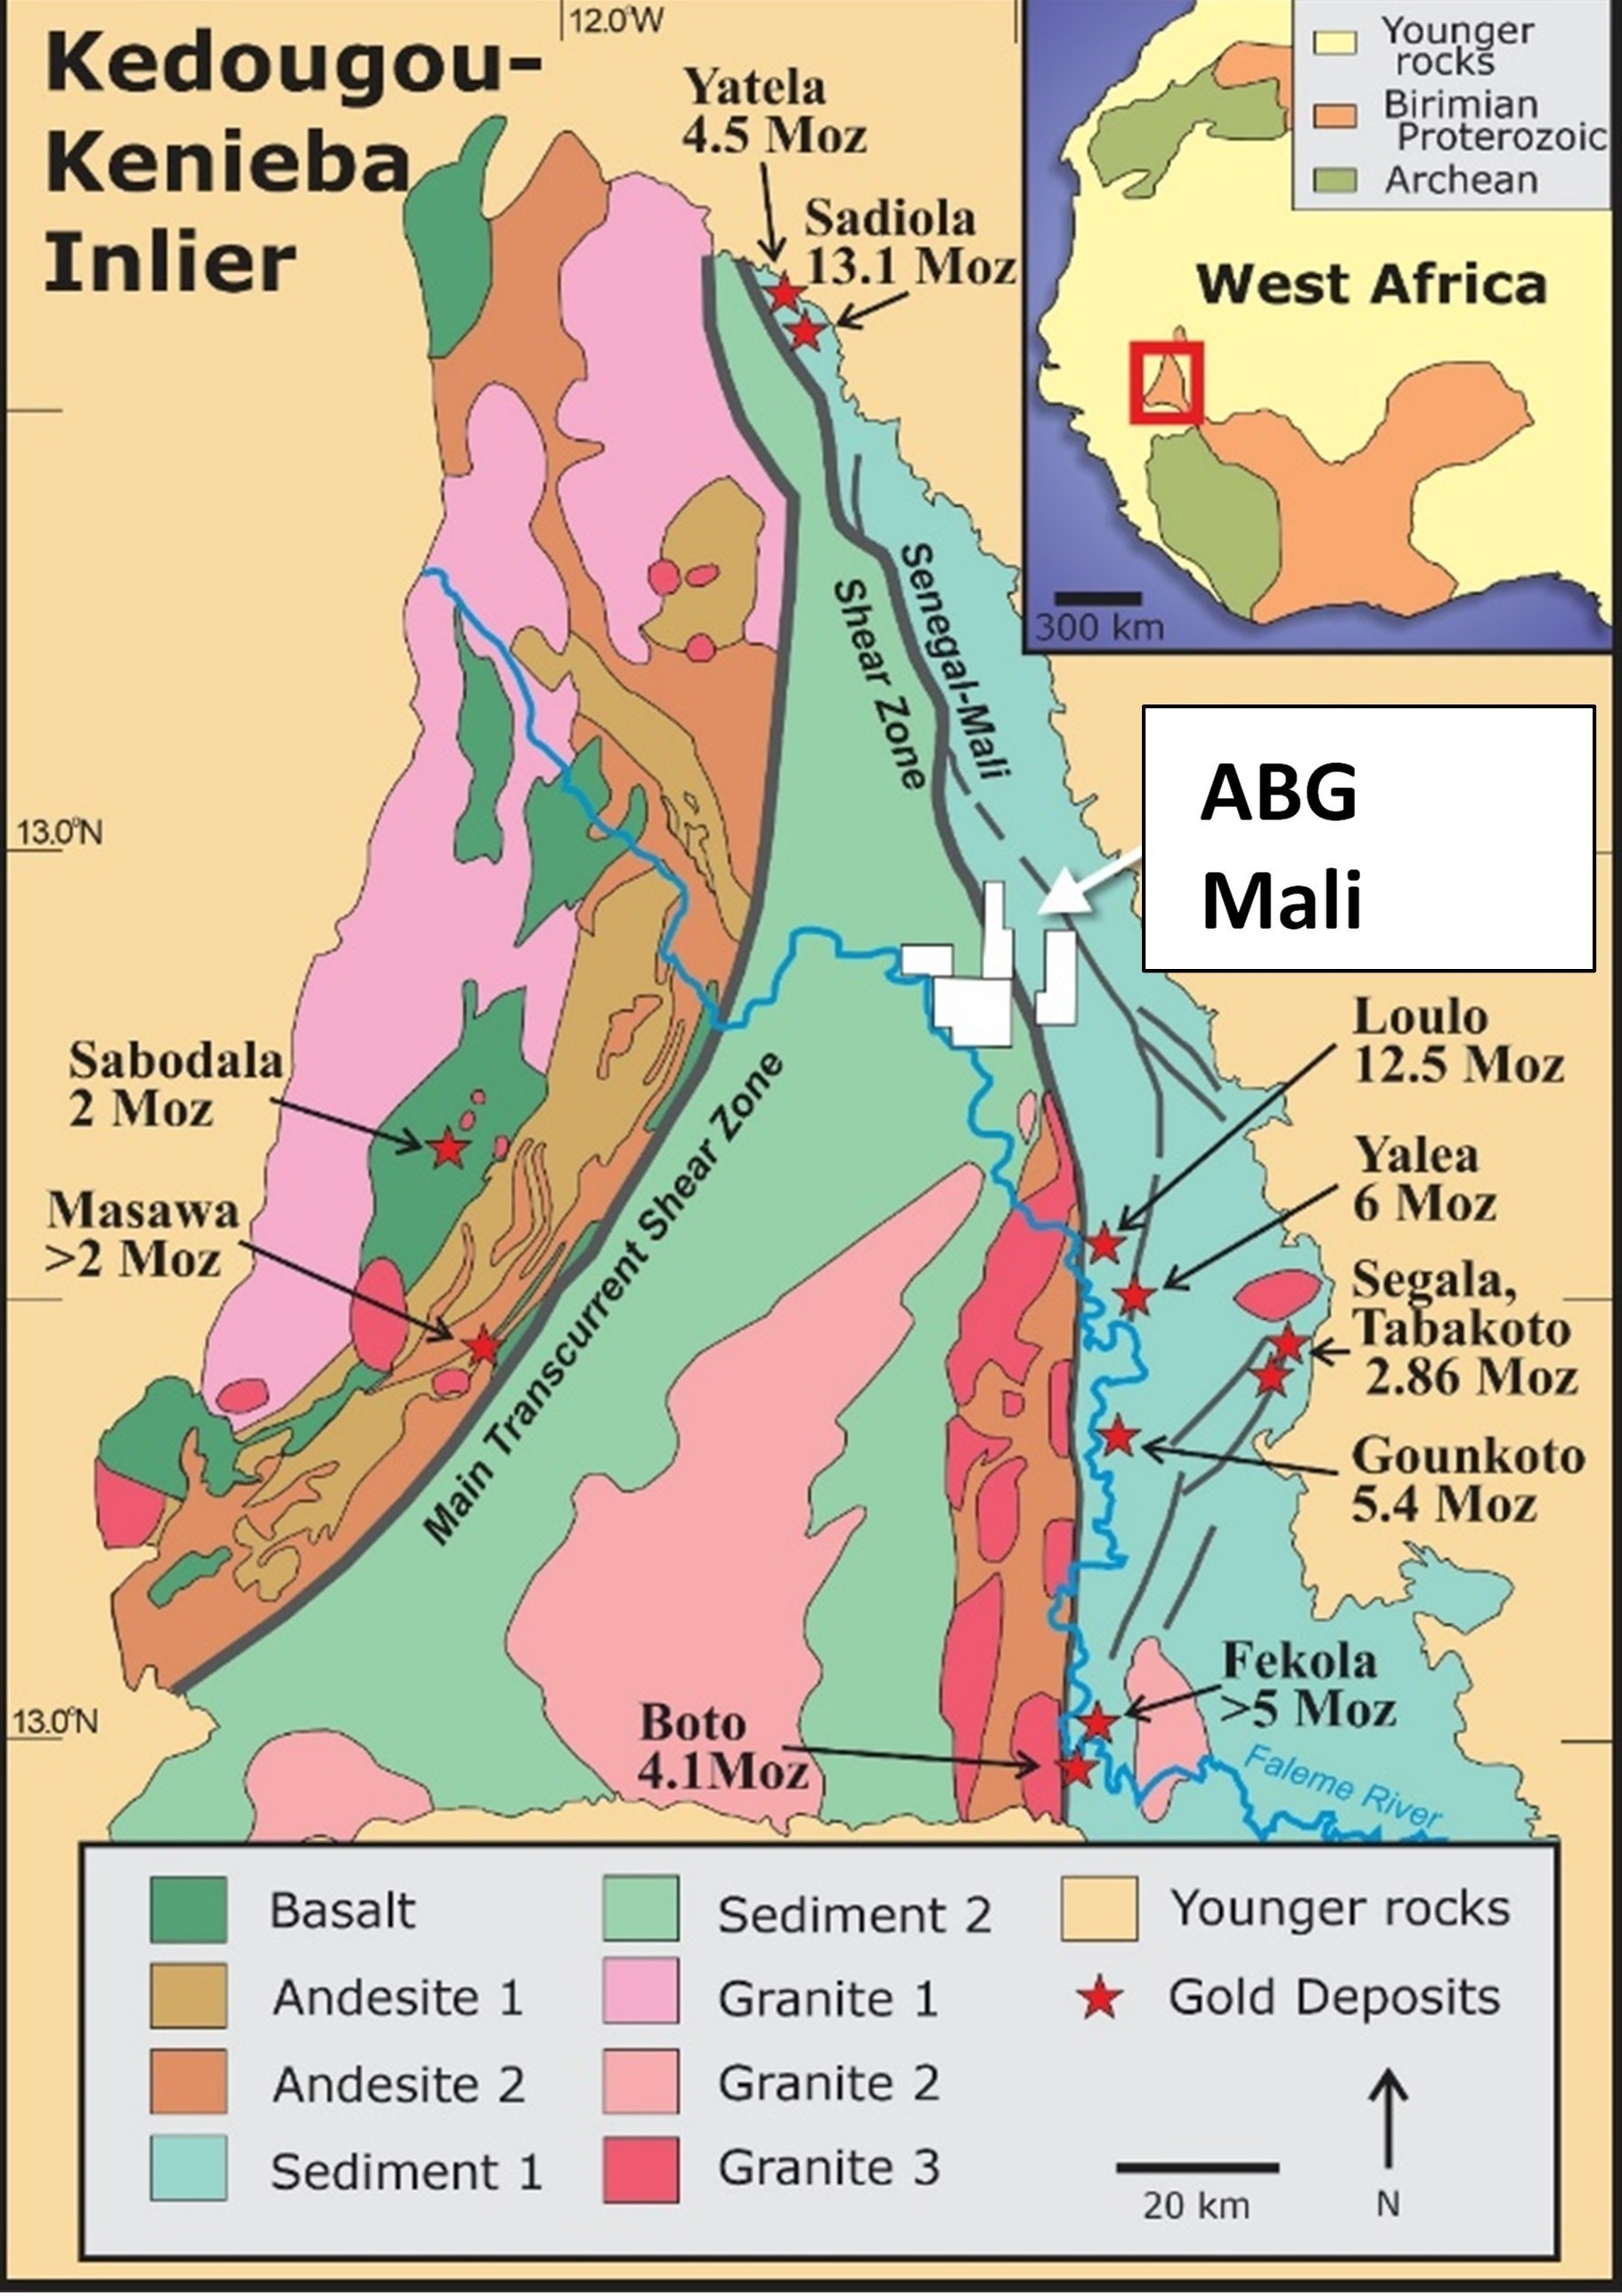 Figure 1: ABG Mali Property Location (CNW Group/Galiano Gold Inc.)